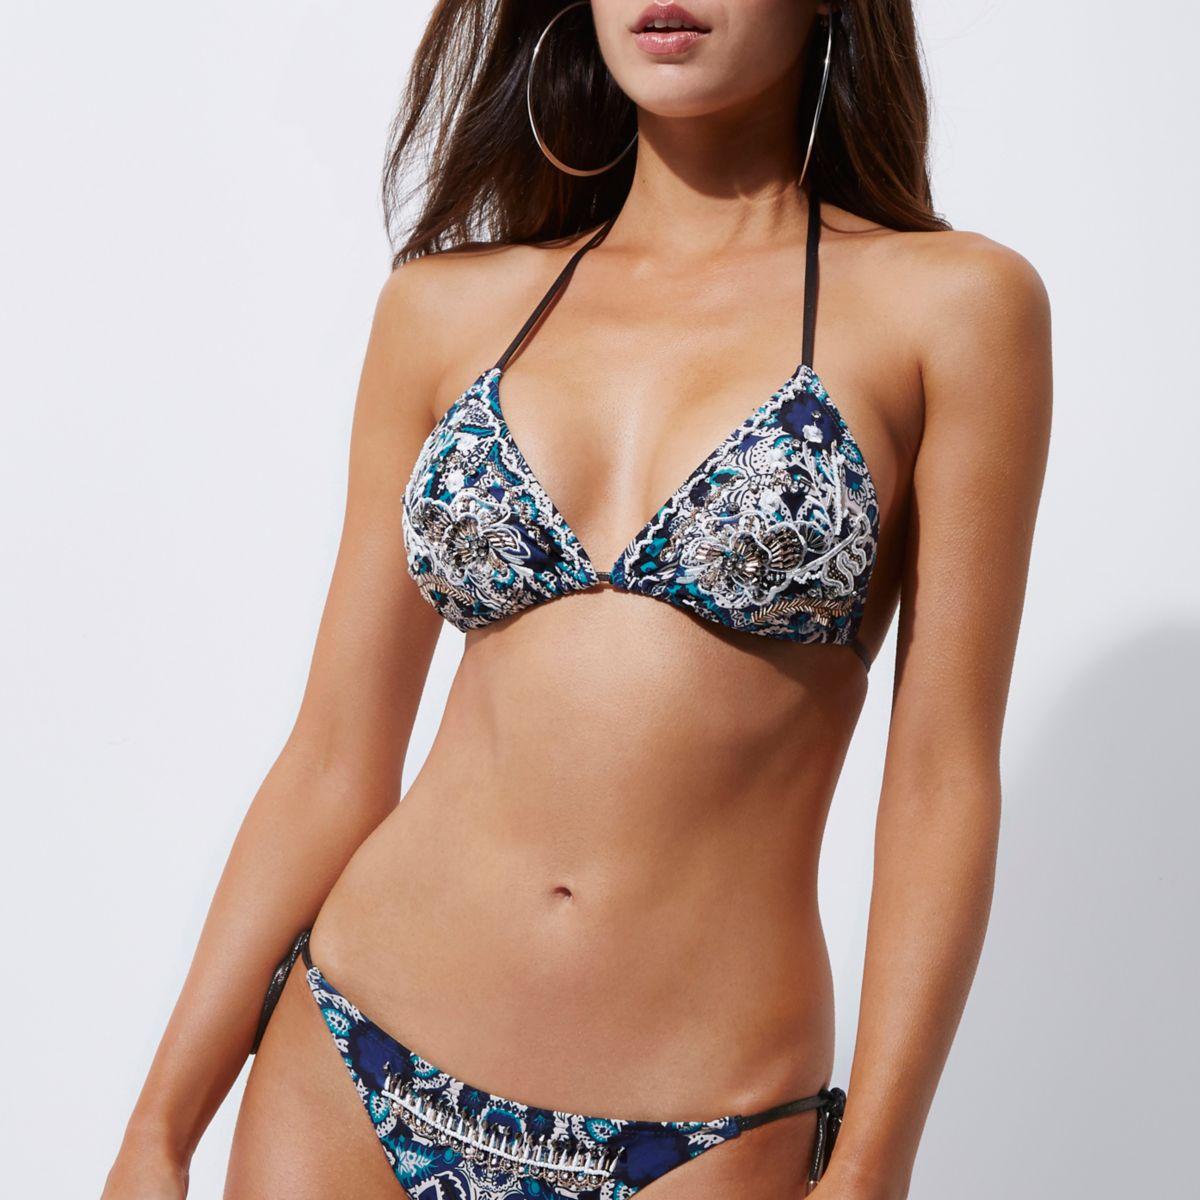 Blue embellished triangle string bikini top